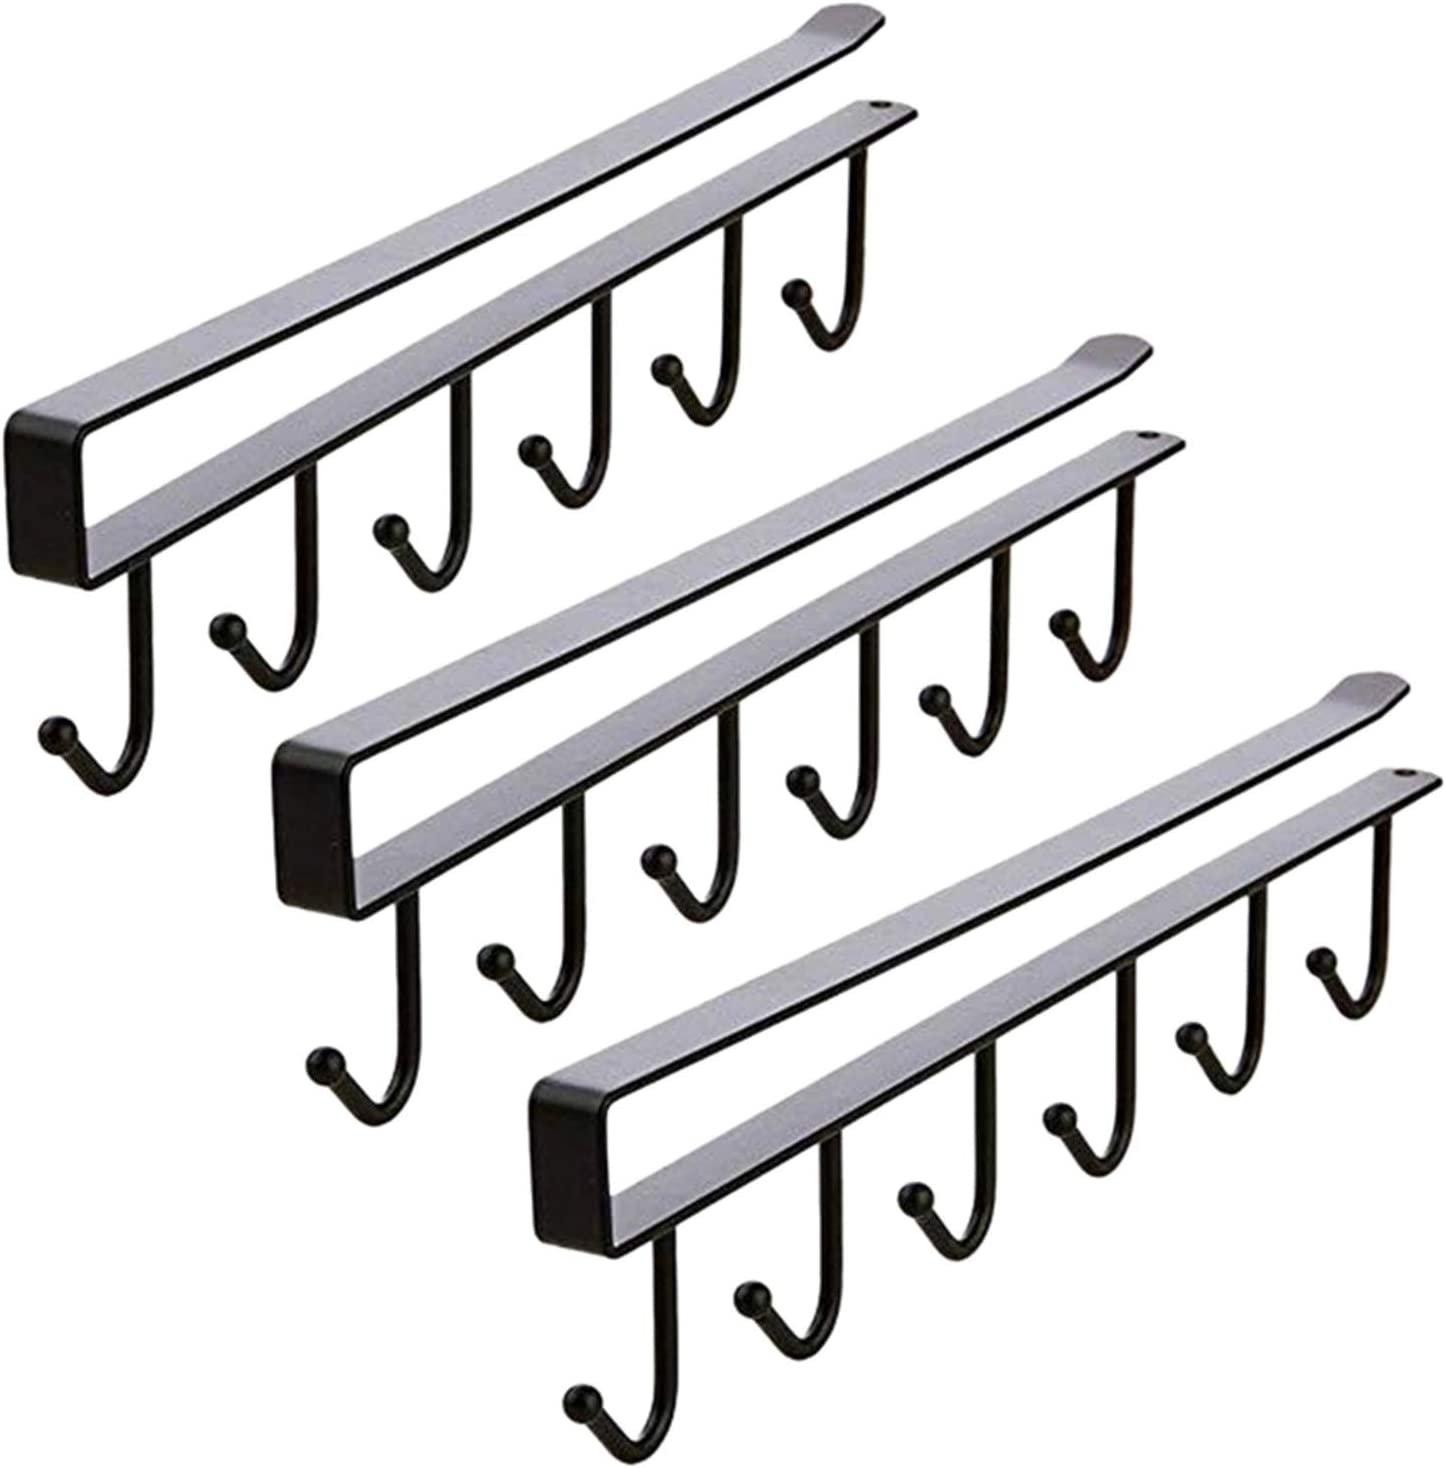 ZXCVB Multi-Function 3pcs Indefinitely X 6 Cheap mail order specialty store Hooks Under Holder Cof Mug Cabinet